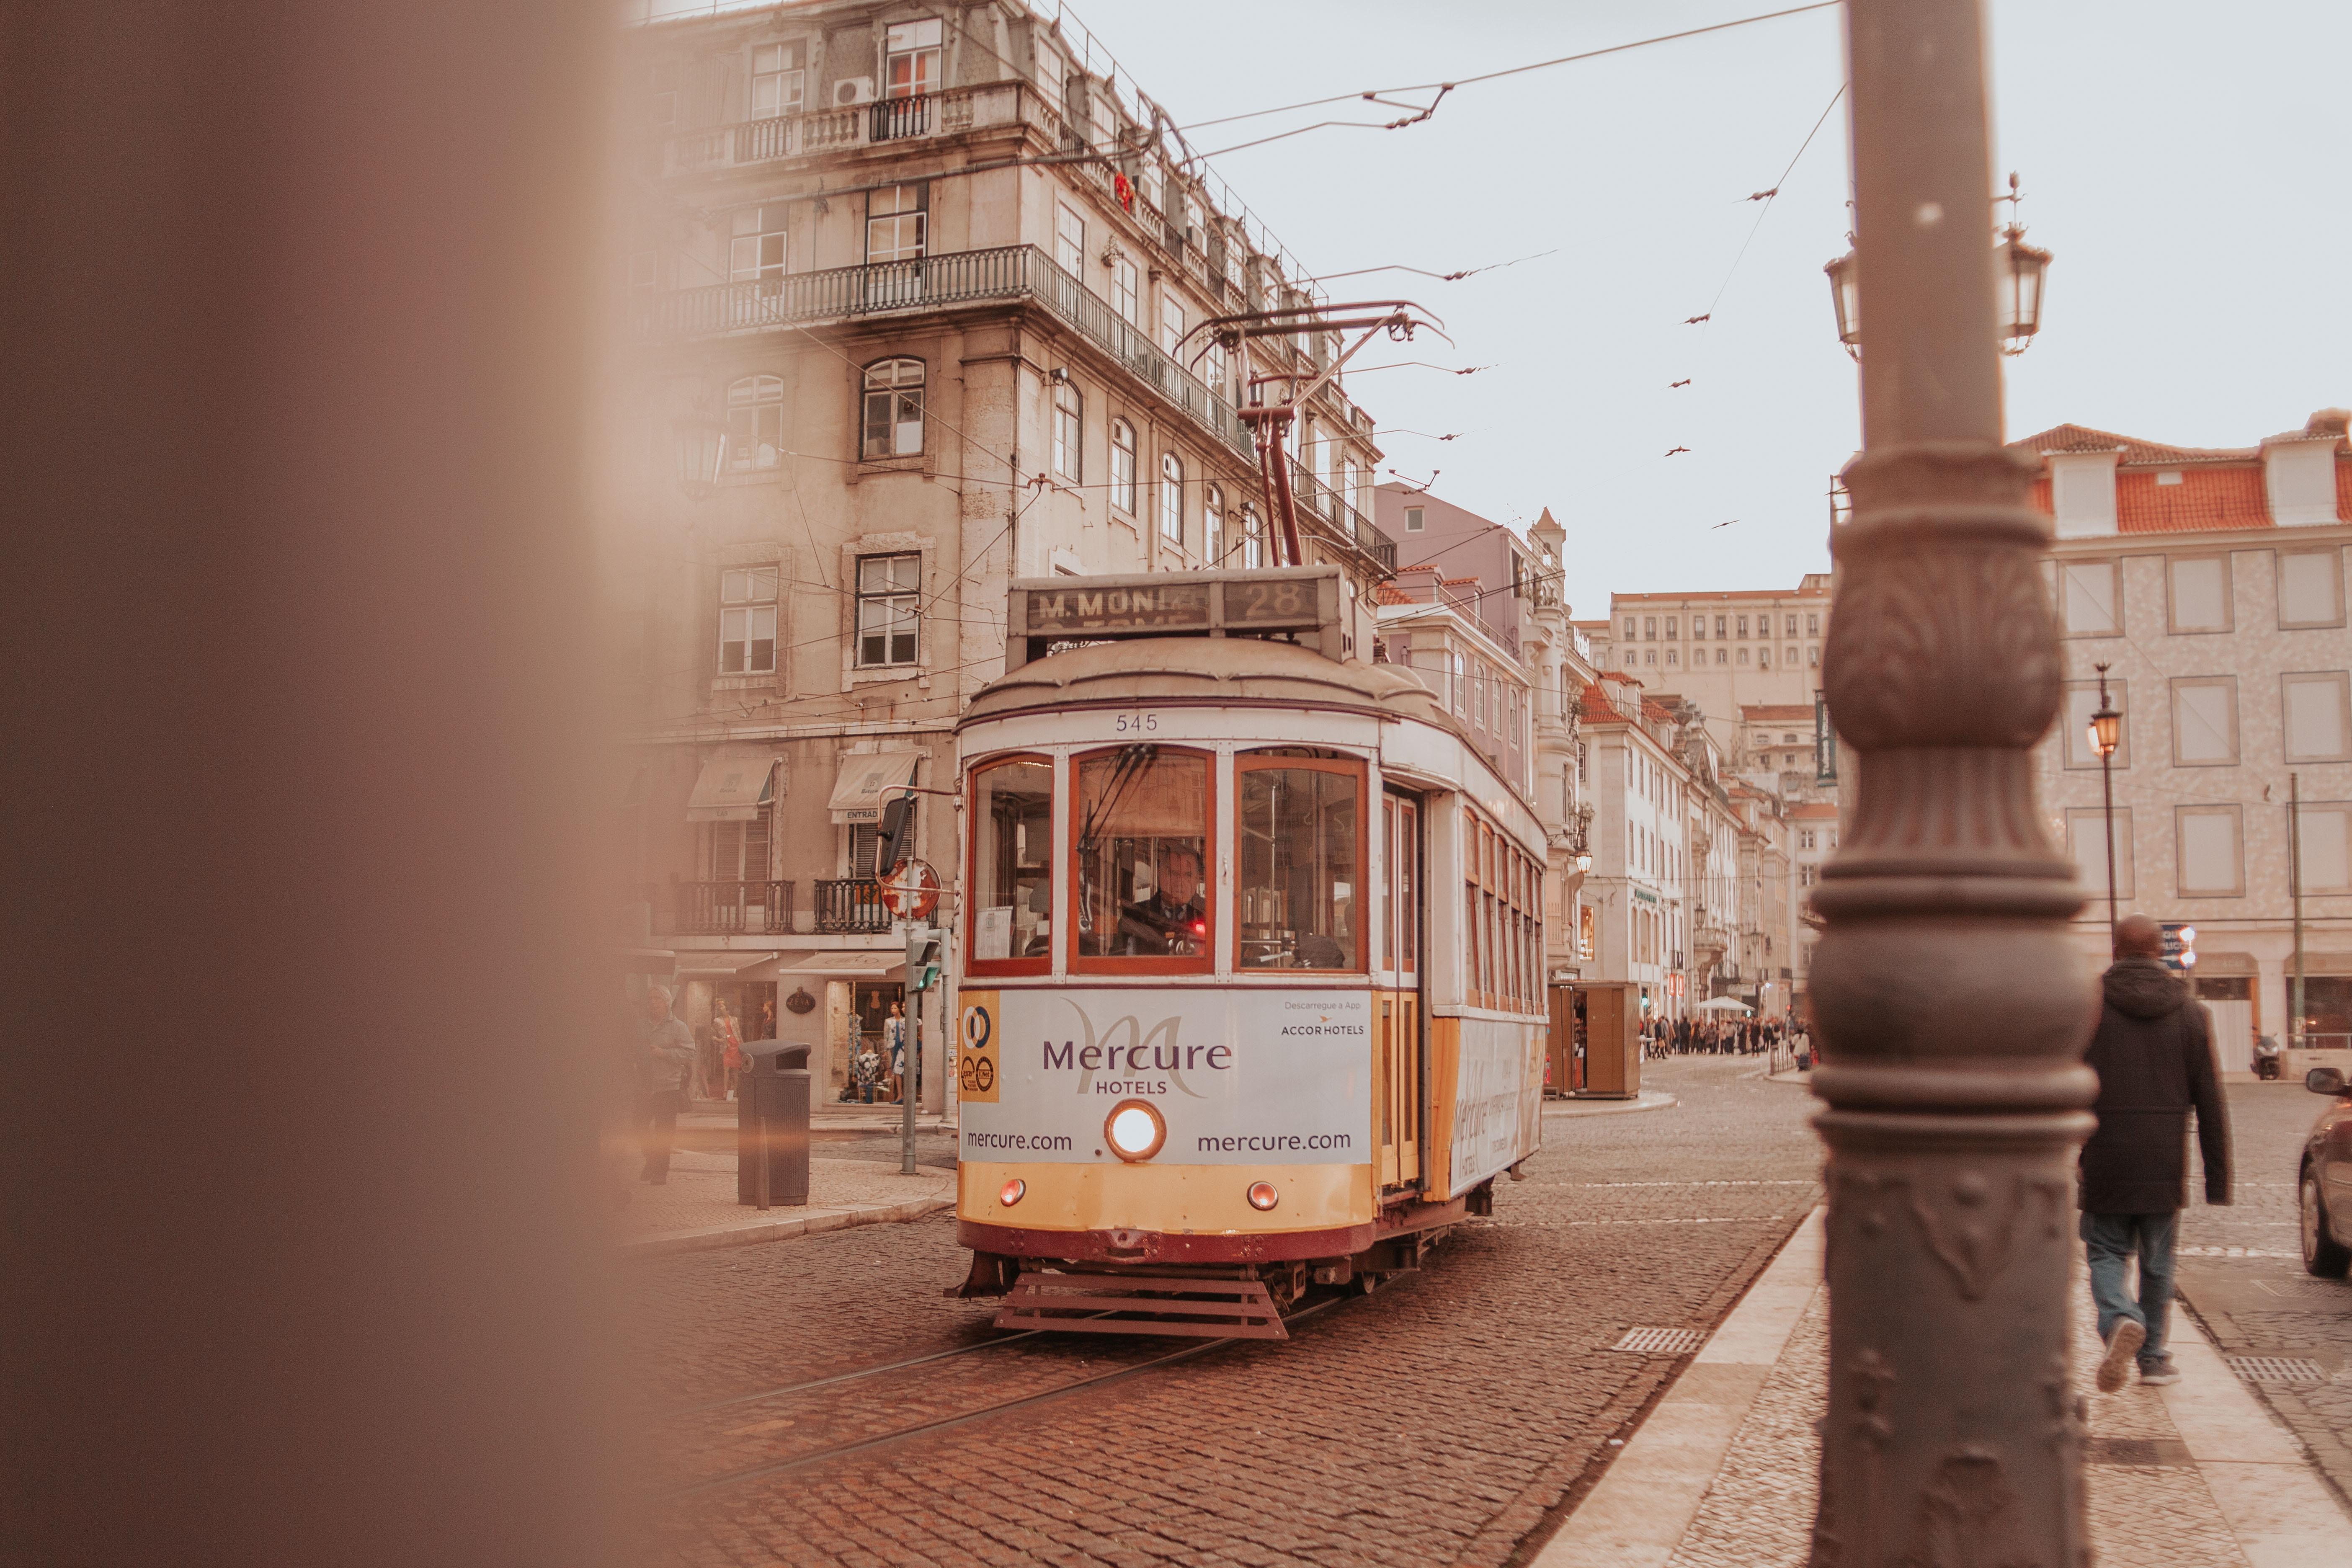 Tour en tramway privatisé